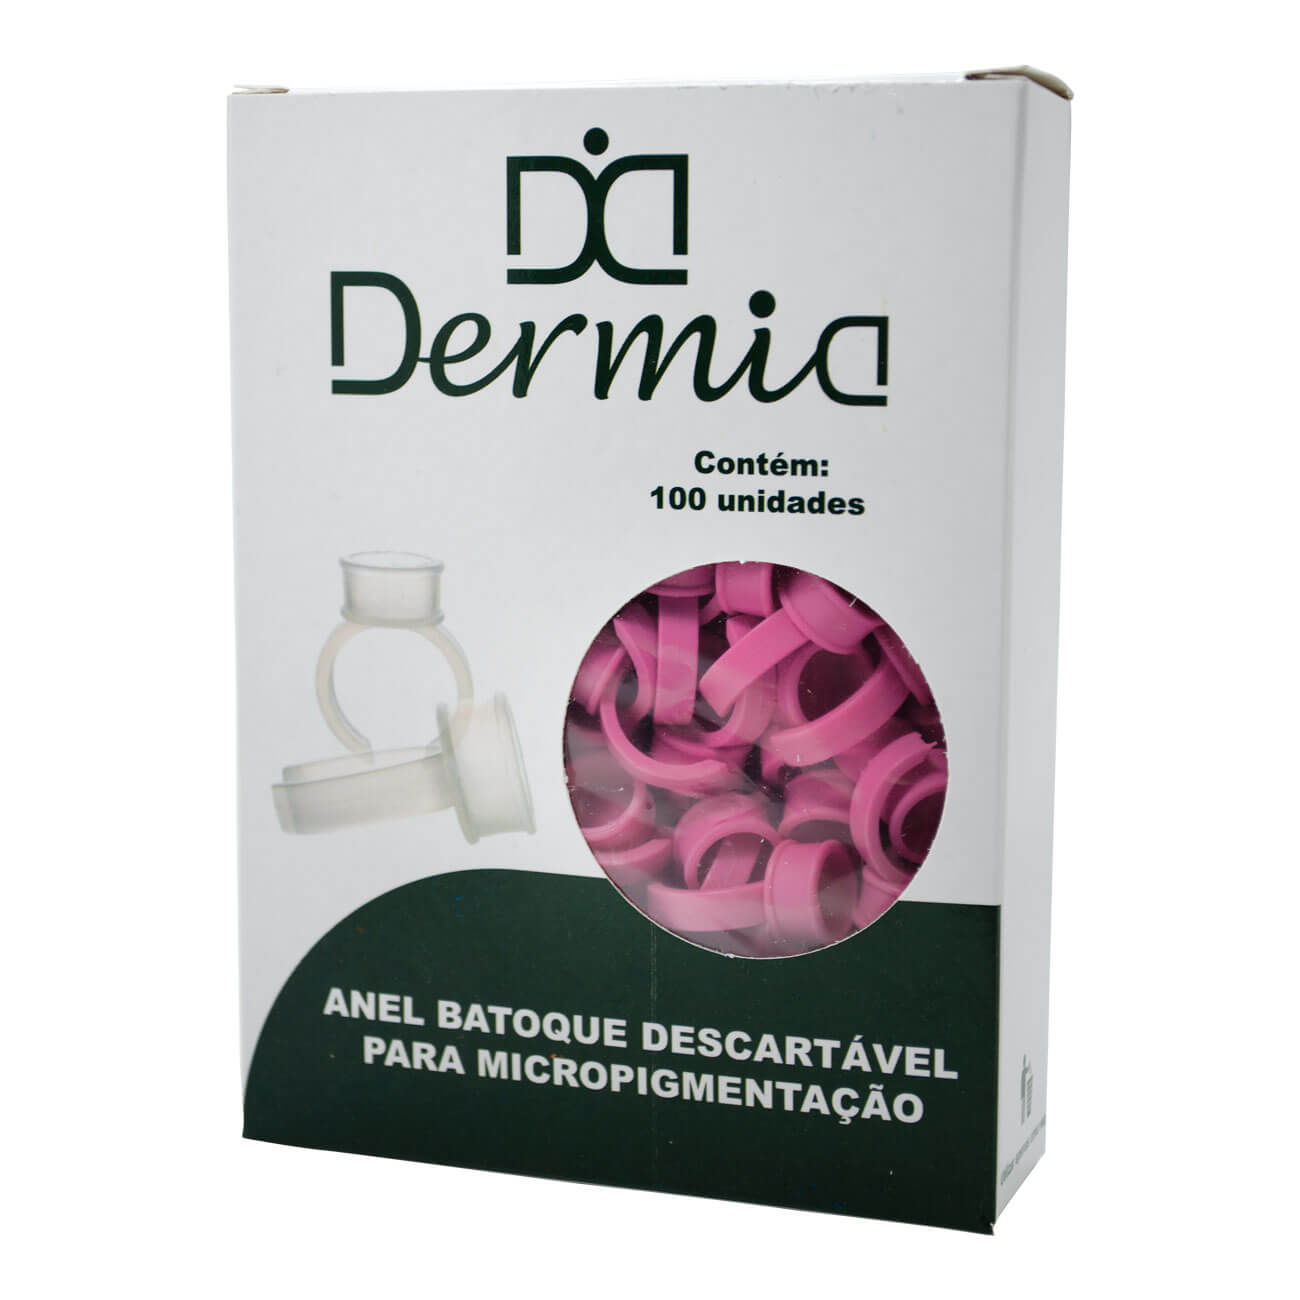 Anel Batoque Descartável Dermia 100un